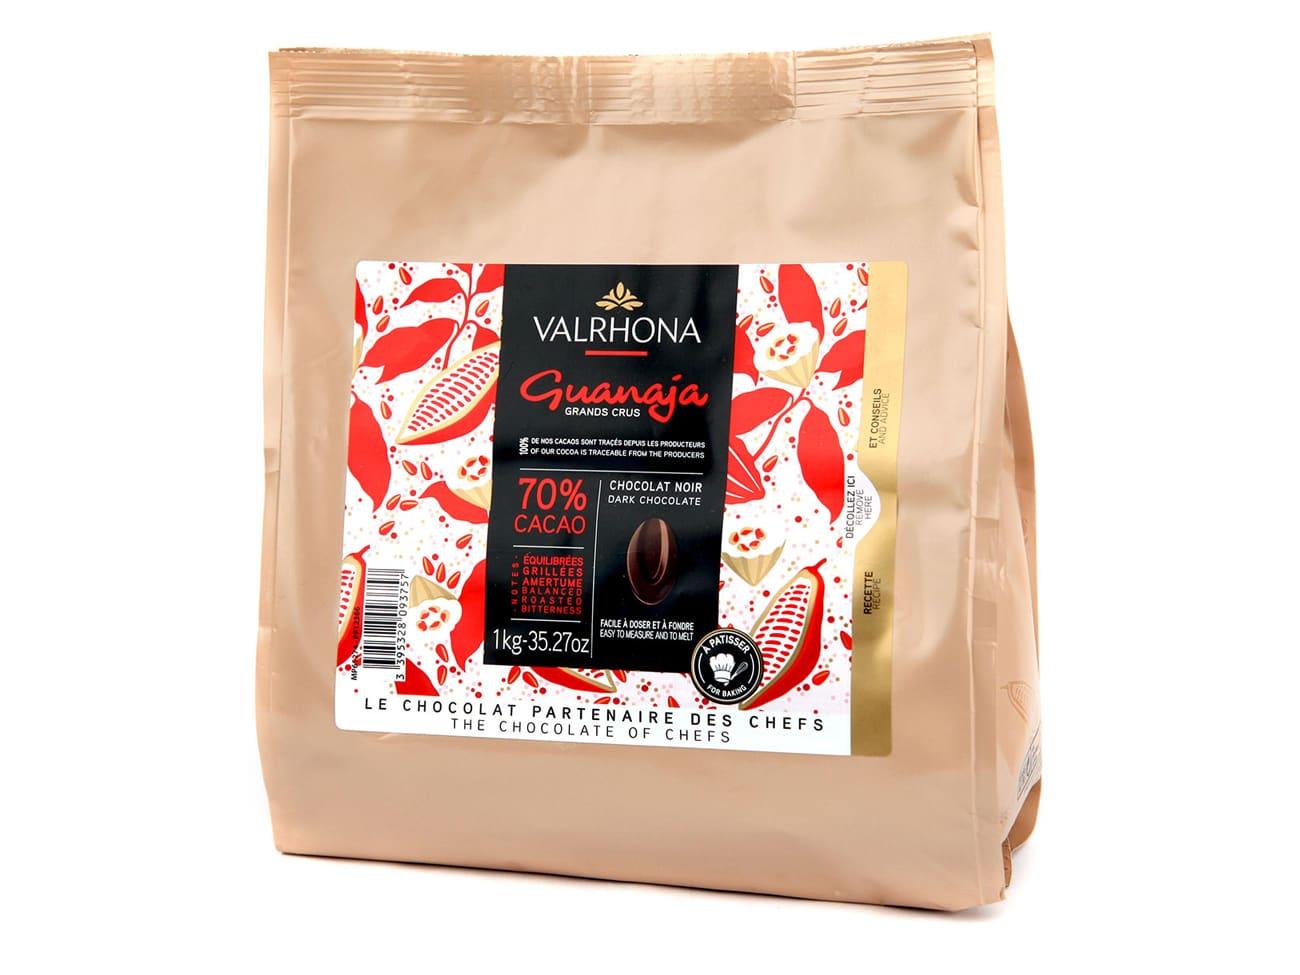 Valrhona cocoa paste